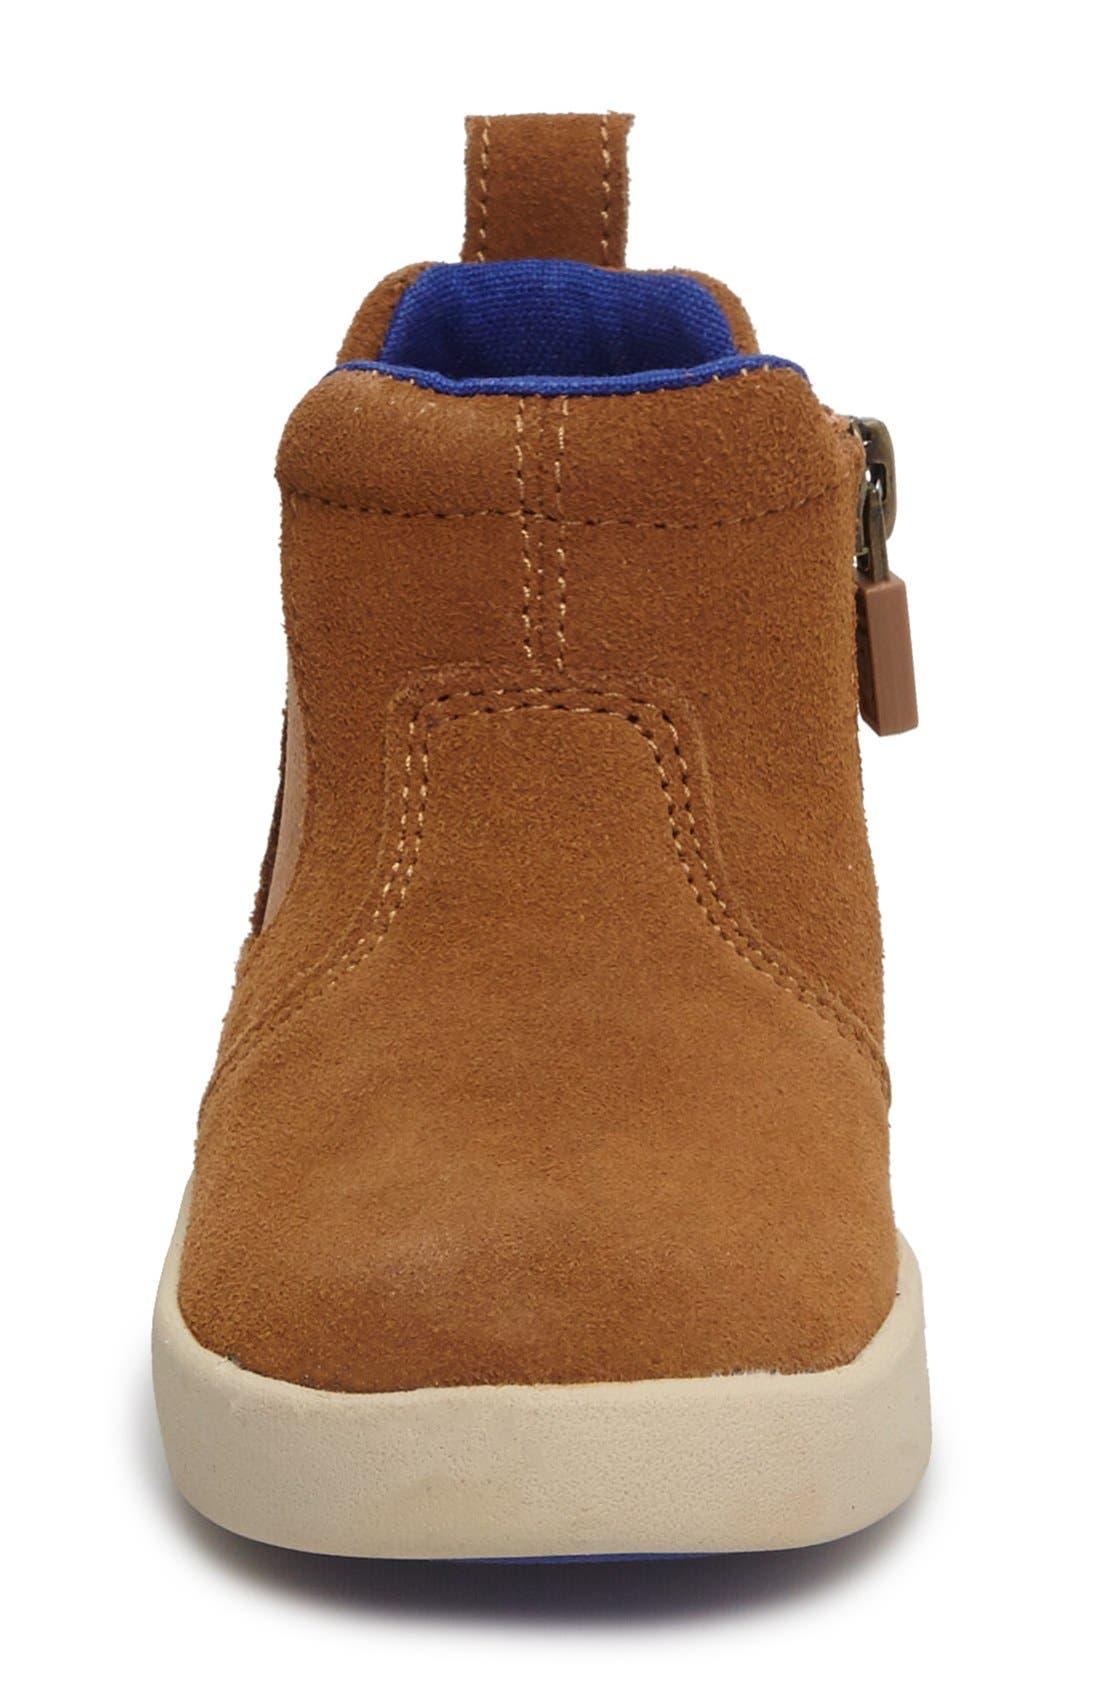 Alternate Image 3  - UGG® Hamden Sneaker (Walker, Toddler, Little Kid & Big Kid)